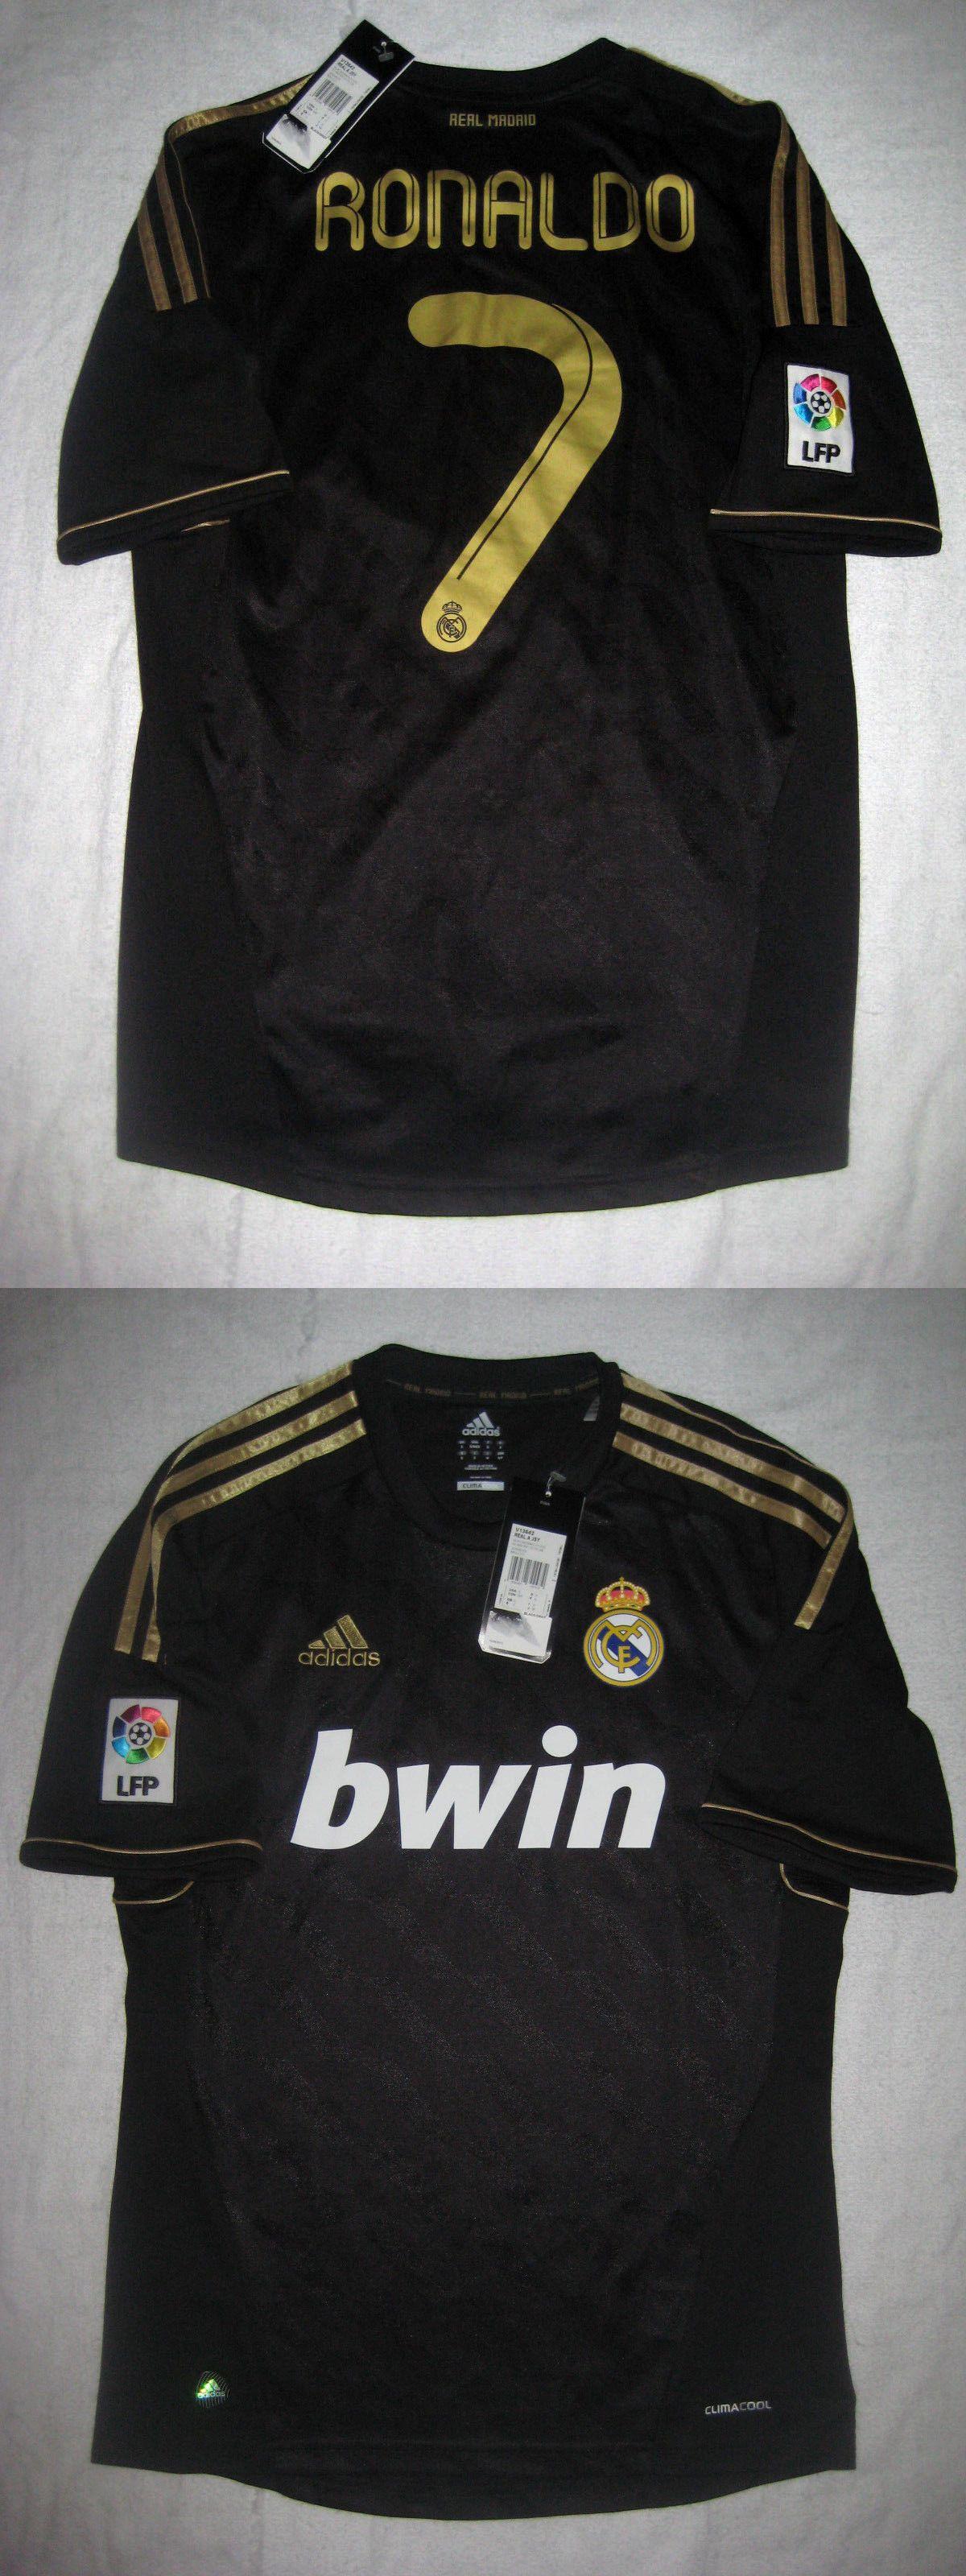 5c3867e6b Soccer-International Clubs 2887  Adidas 2011 2012 Real Madrid Cristiano Ronaldo  Jersey Shirt Manchester